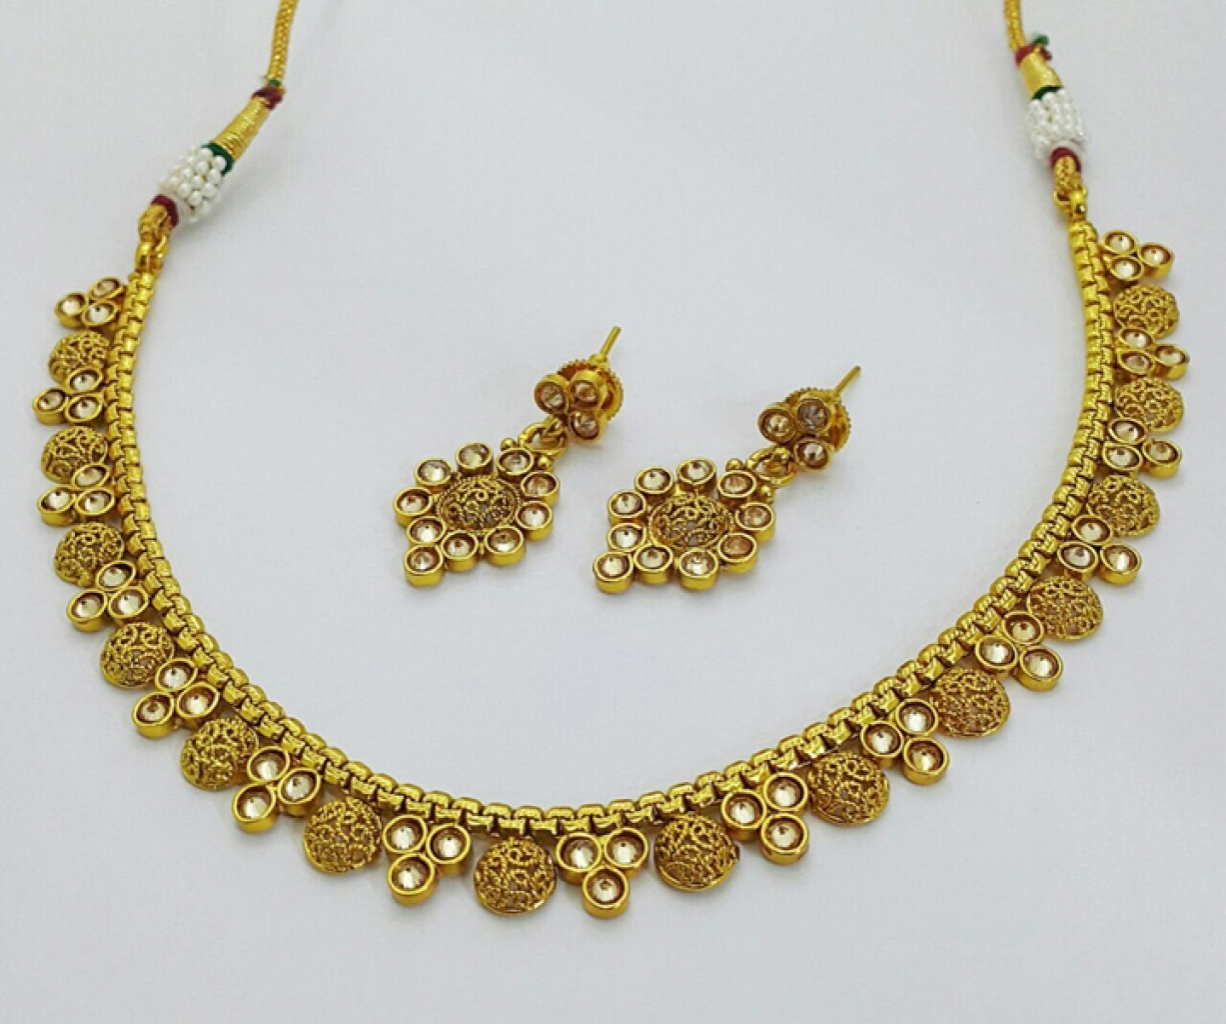 15028355060_Golden-base-polki-necklace-set-1650.jpg